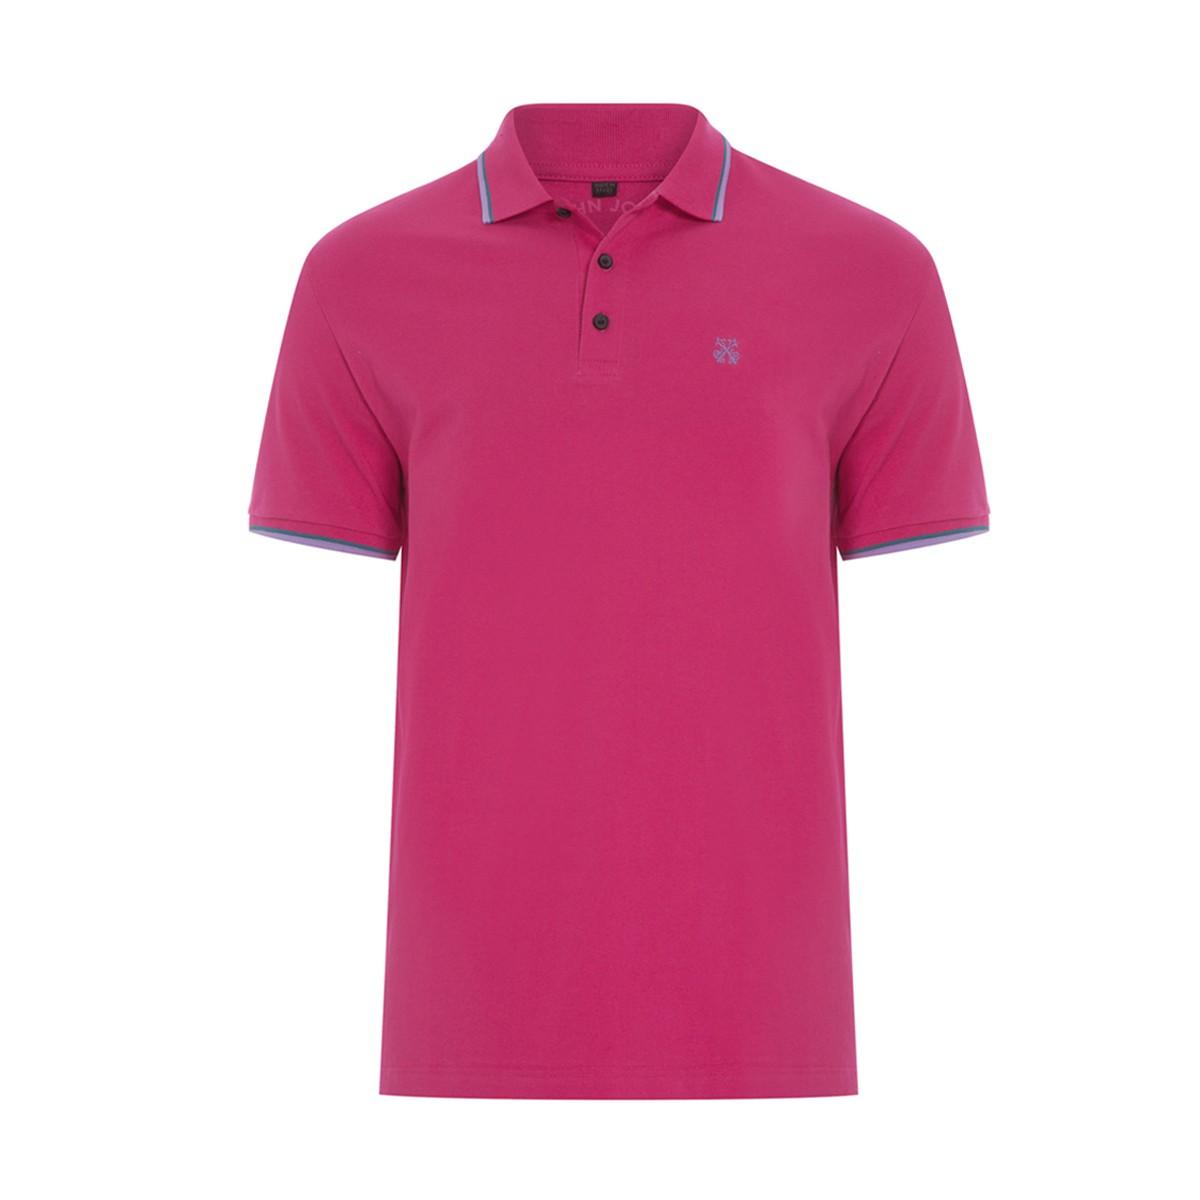 Camisa Polo John John 2 Lines Cherry Rosa Escuro